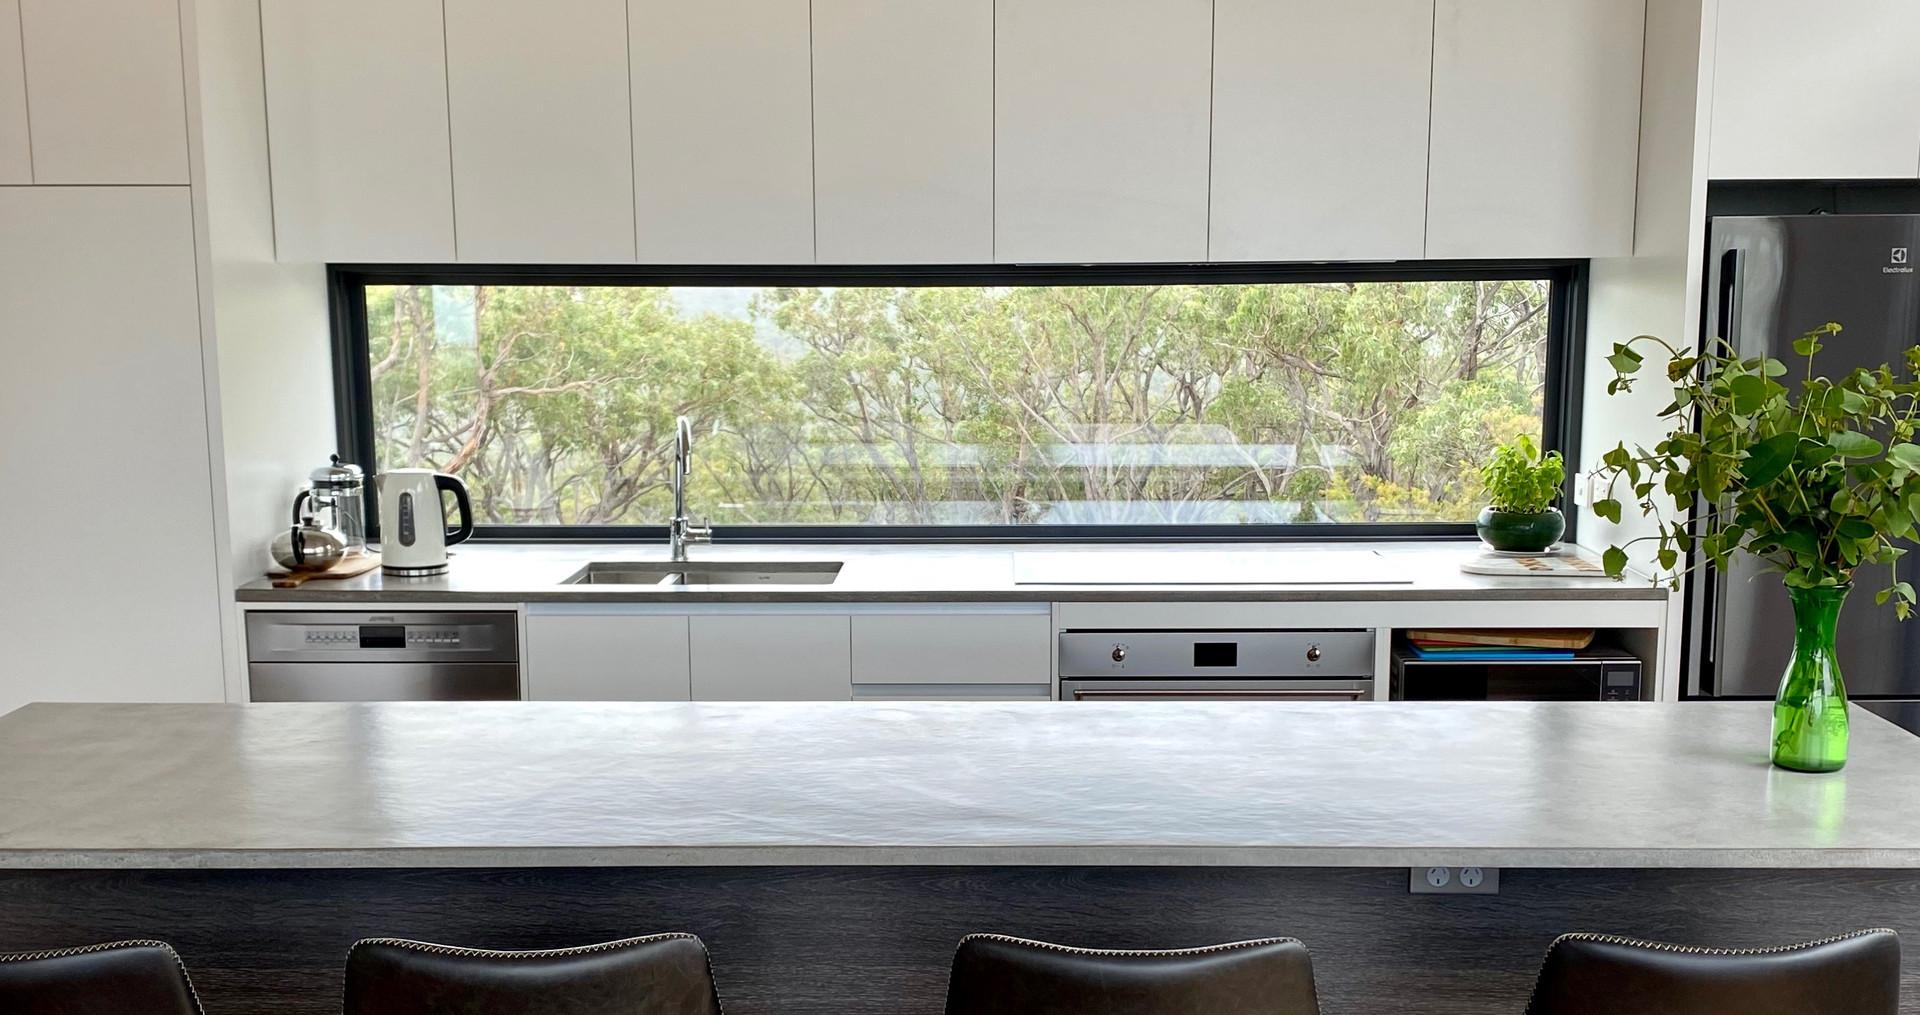 Airey's Inlet - Concrete Kitchen Design